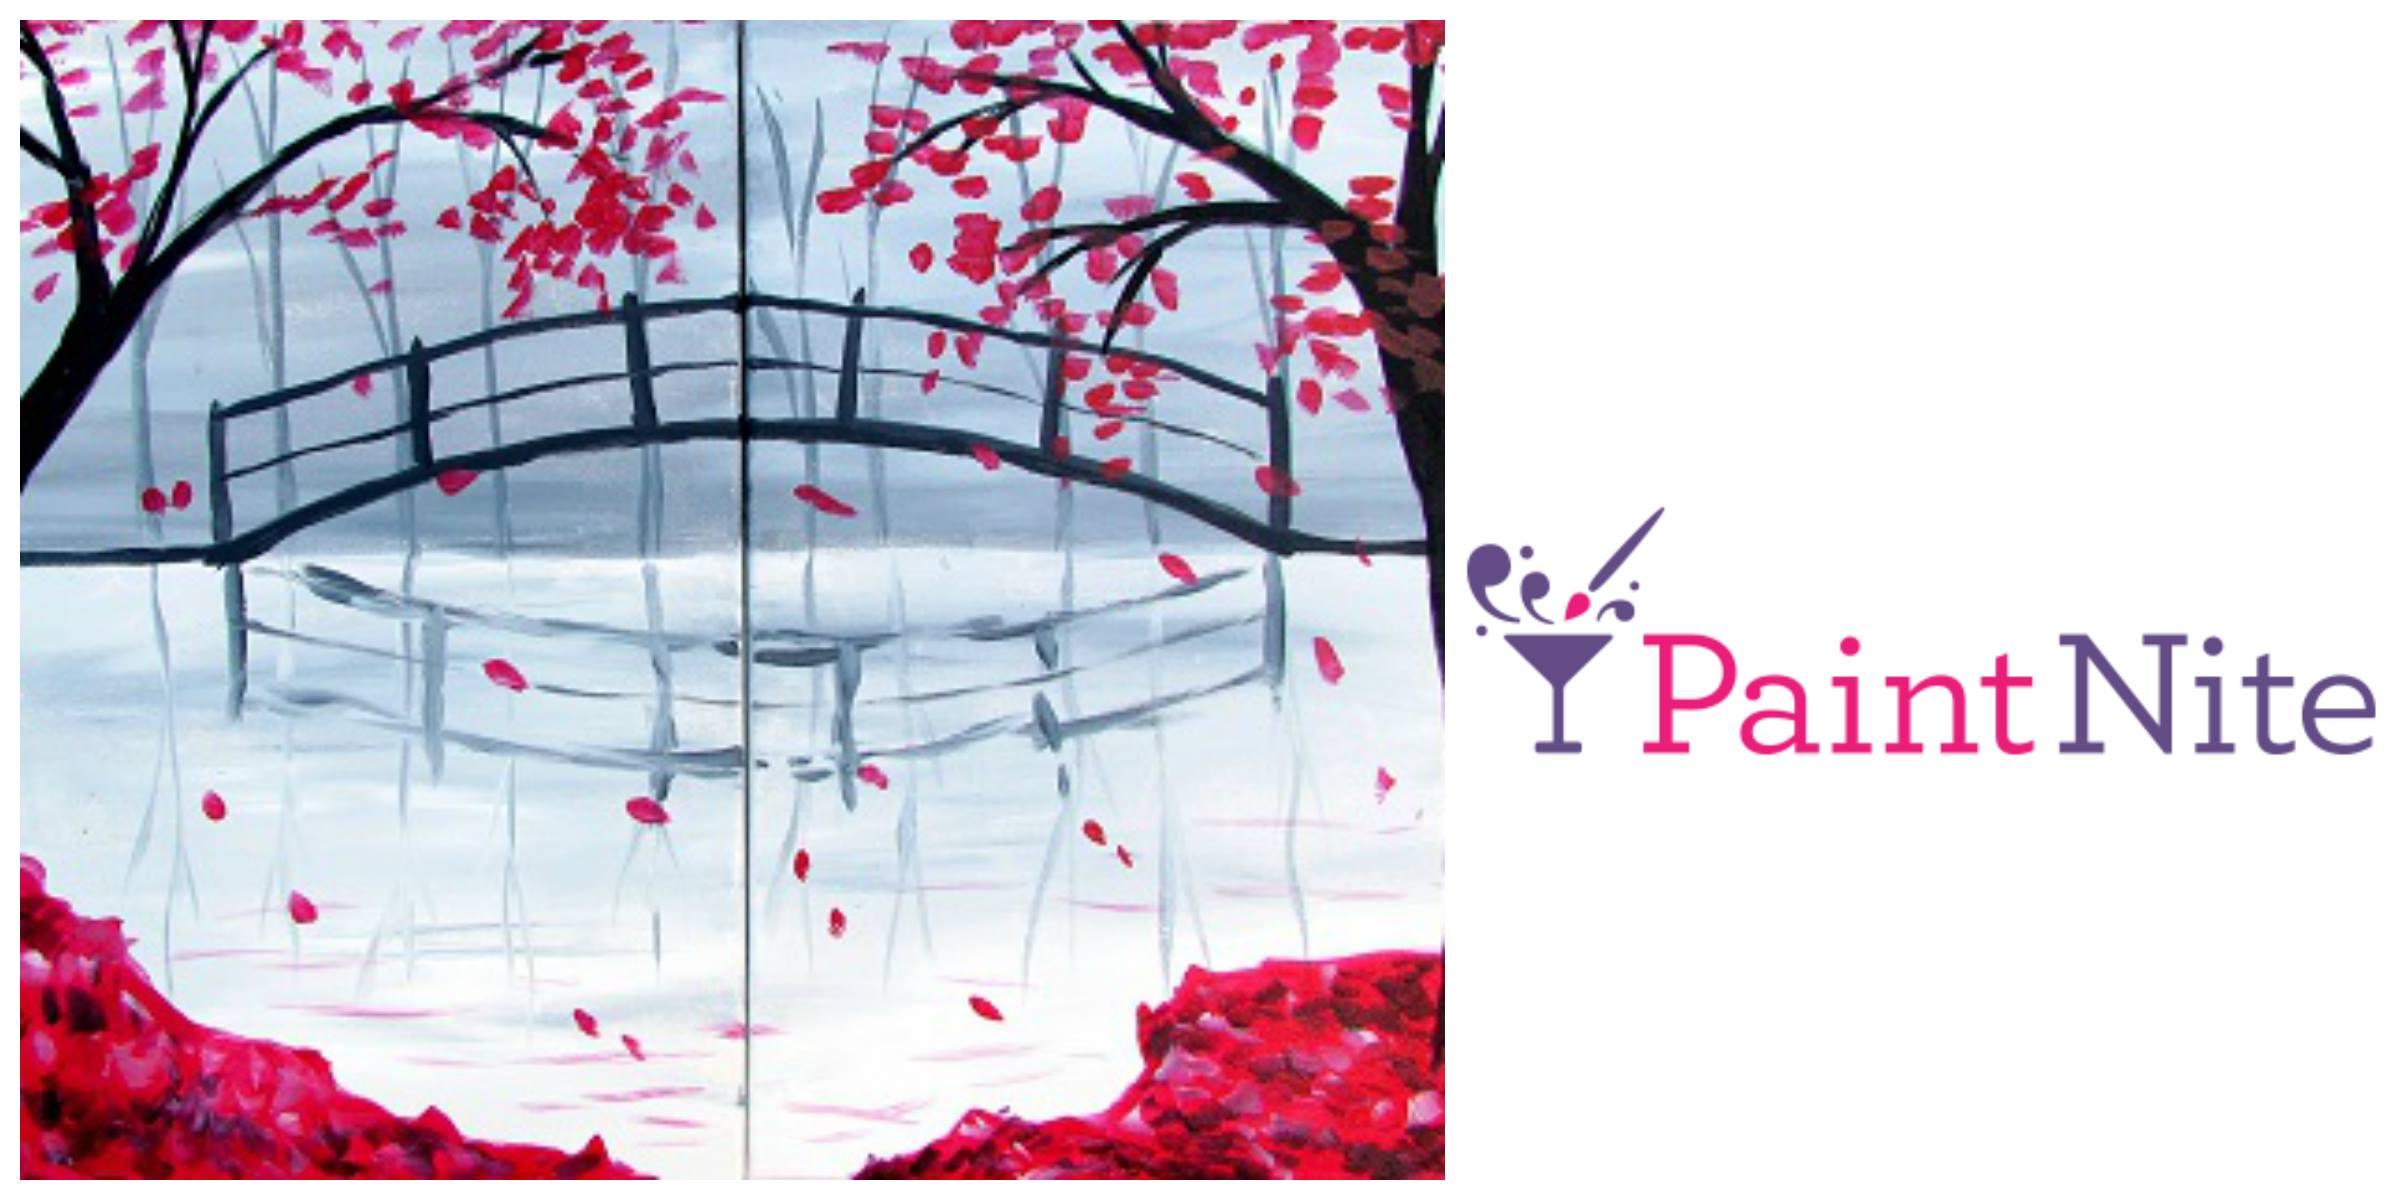 Bridge in the Fall - Valentine's Partner Painting Logo